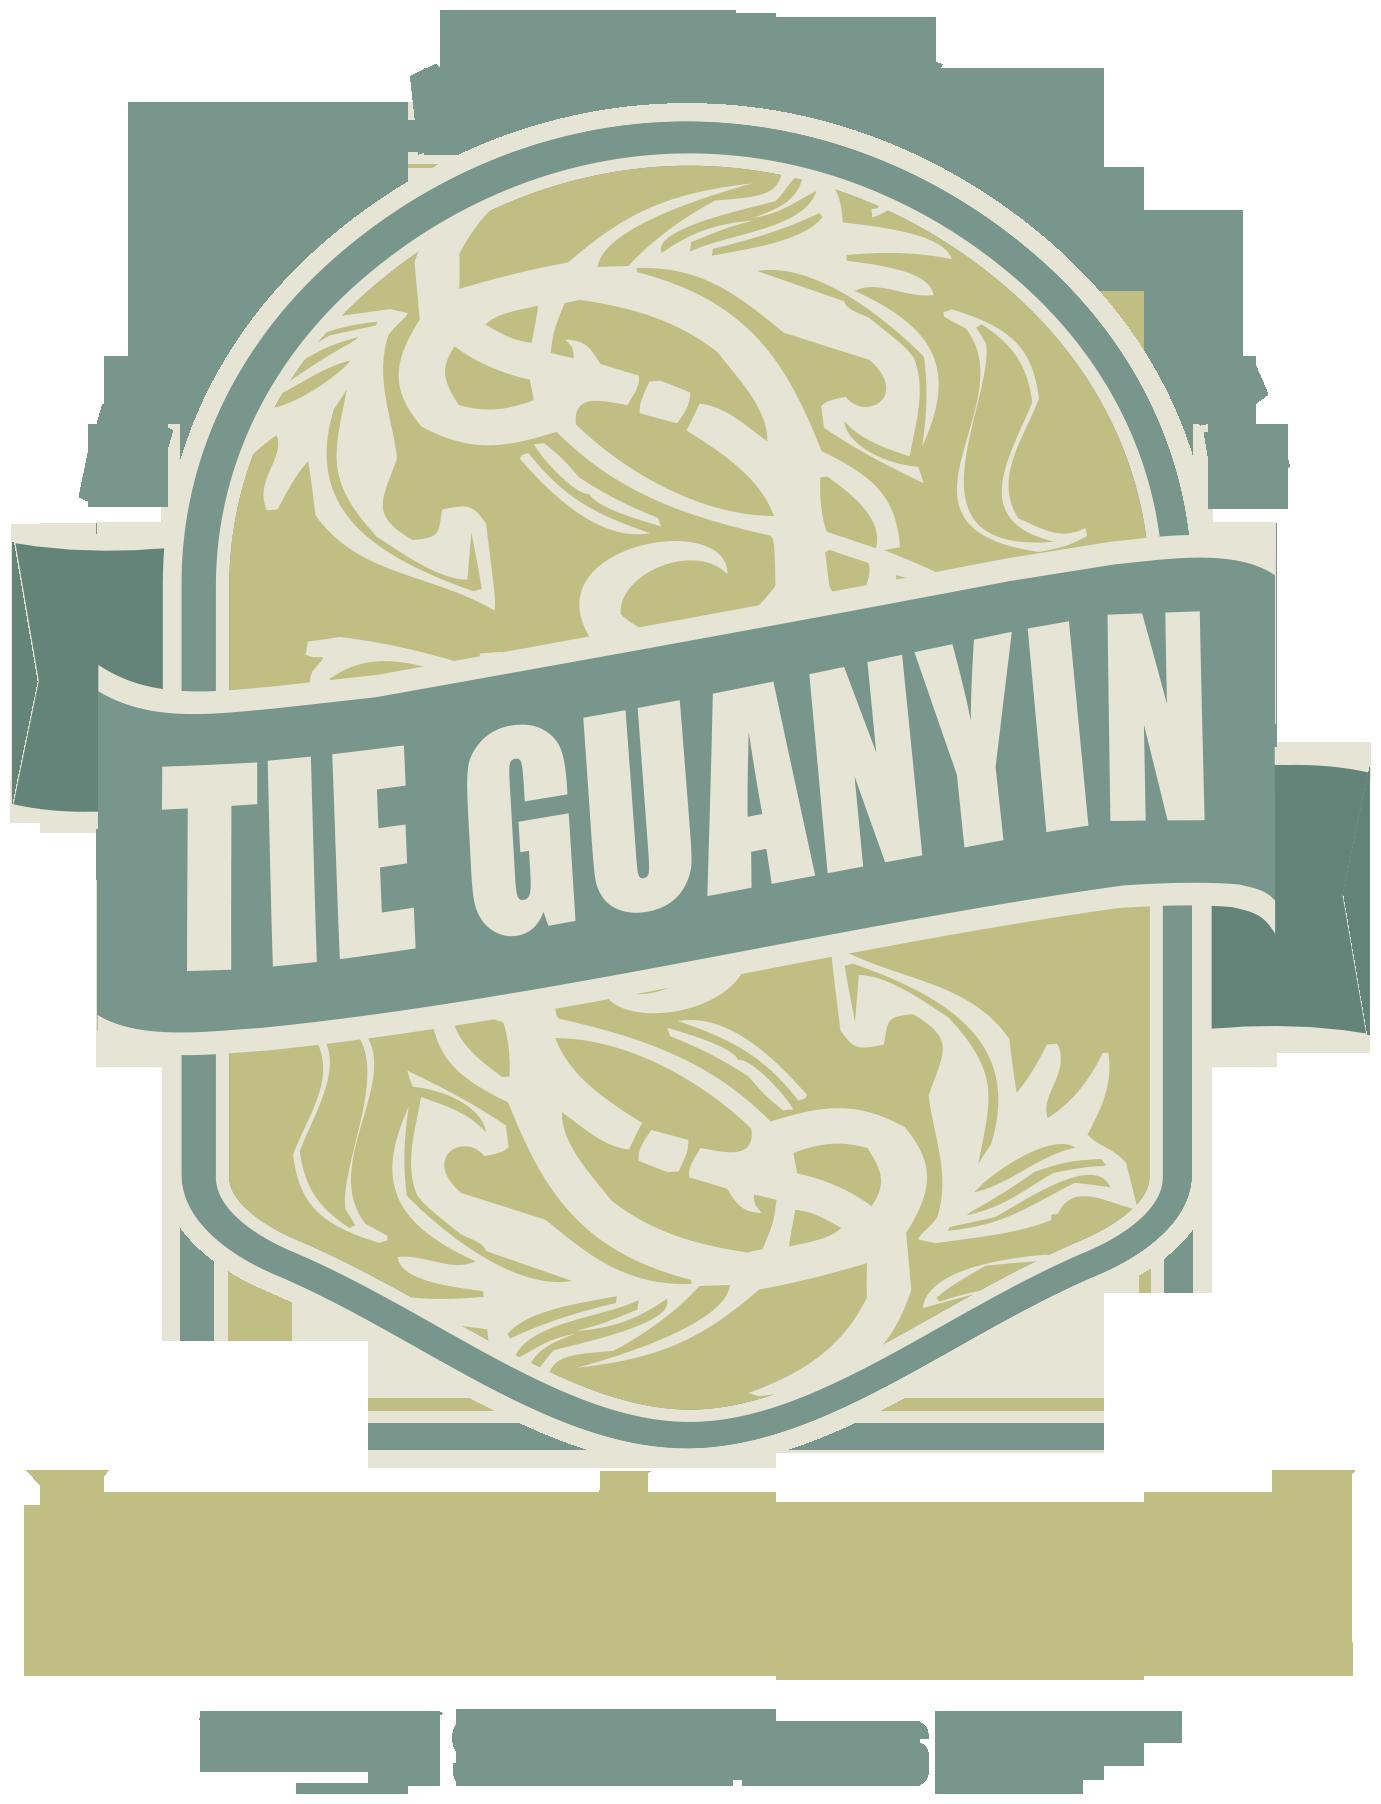 Tie Guanyin